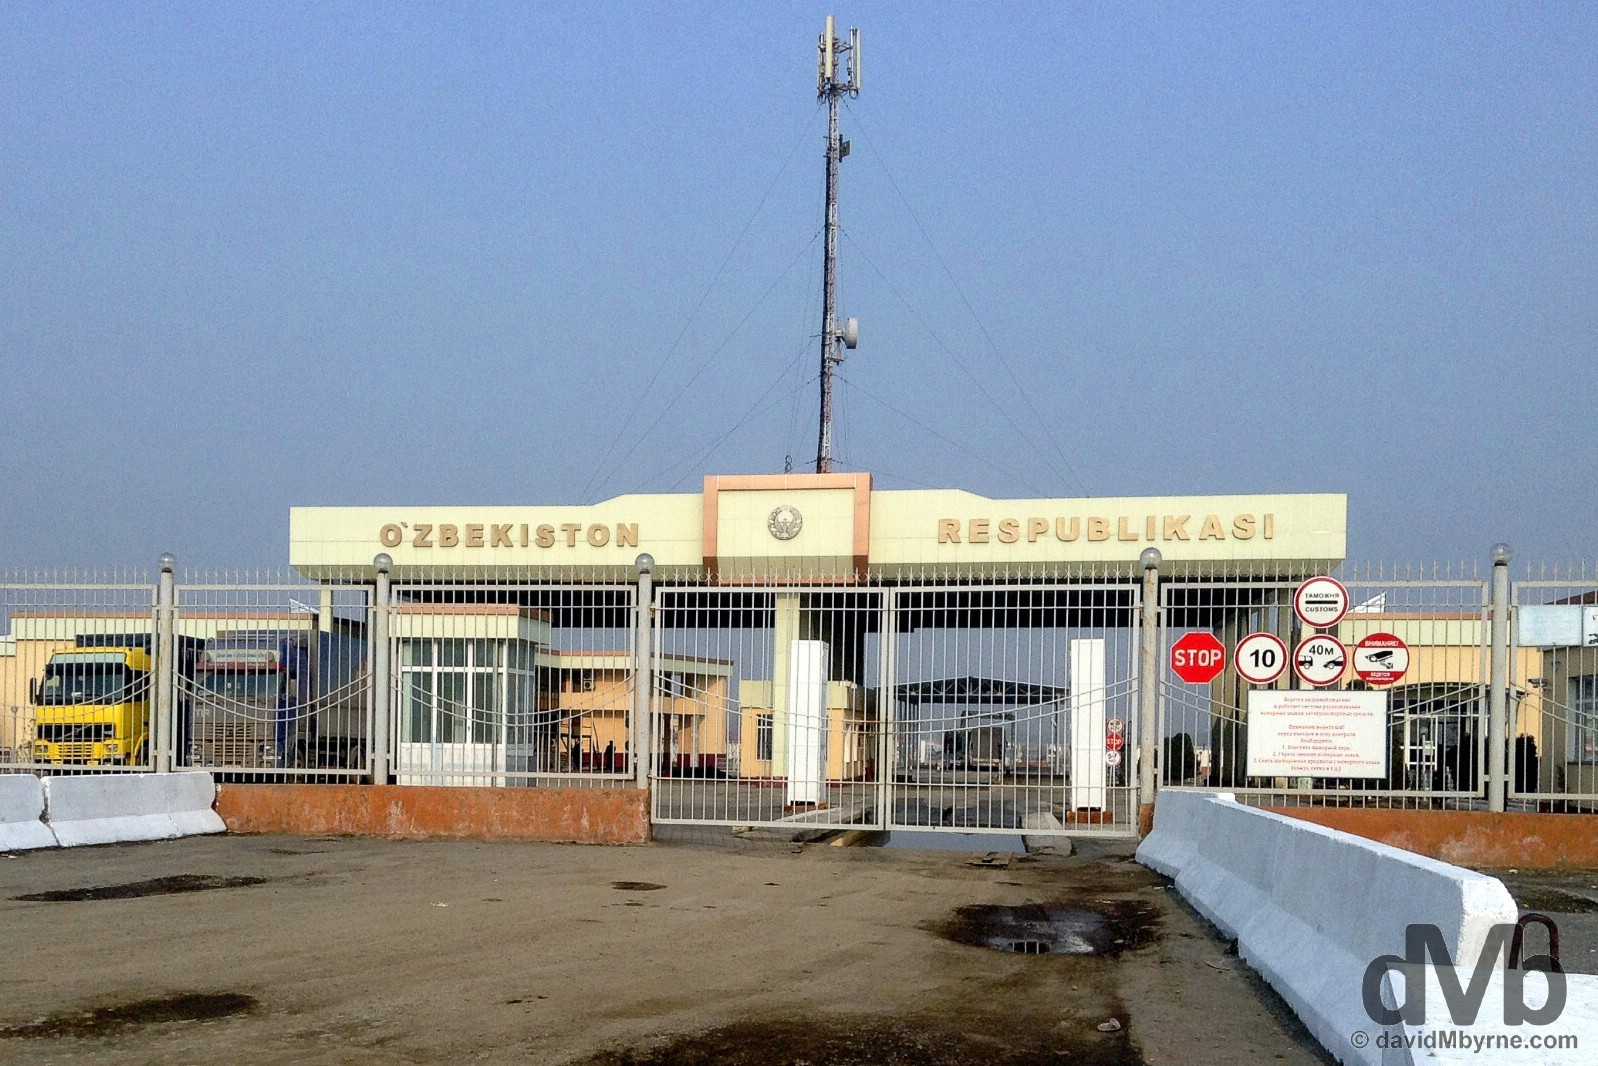 The Dostyk-Dustlyk, Kyrgyzstan-Uzbekistan border crossing outside Osh, Kyrgyzstan. March 4, 2015.